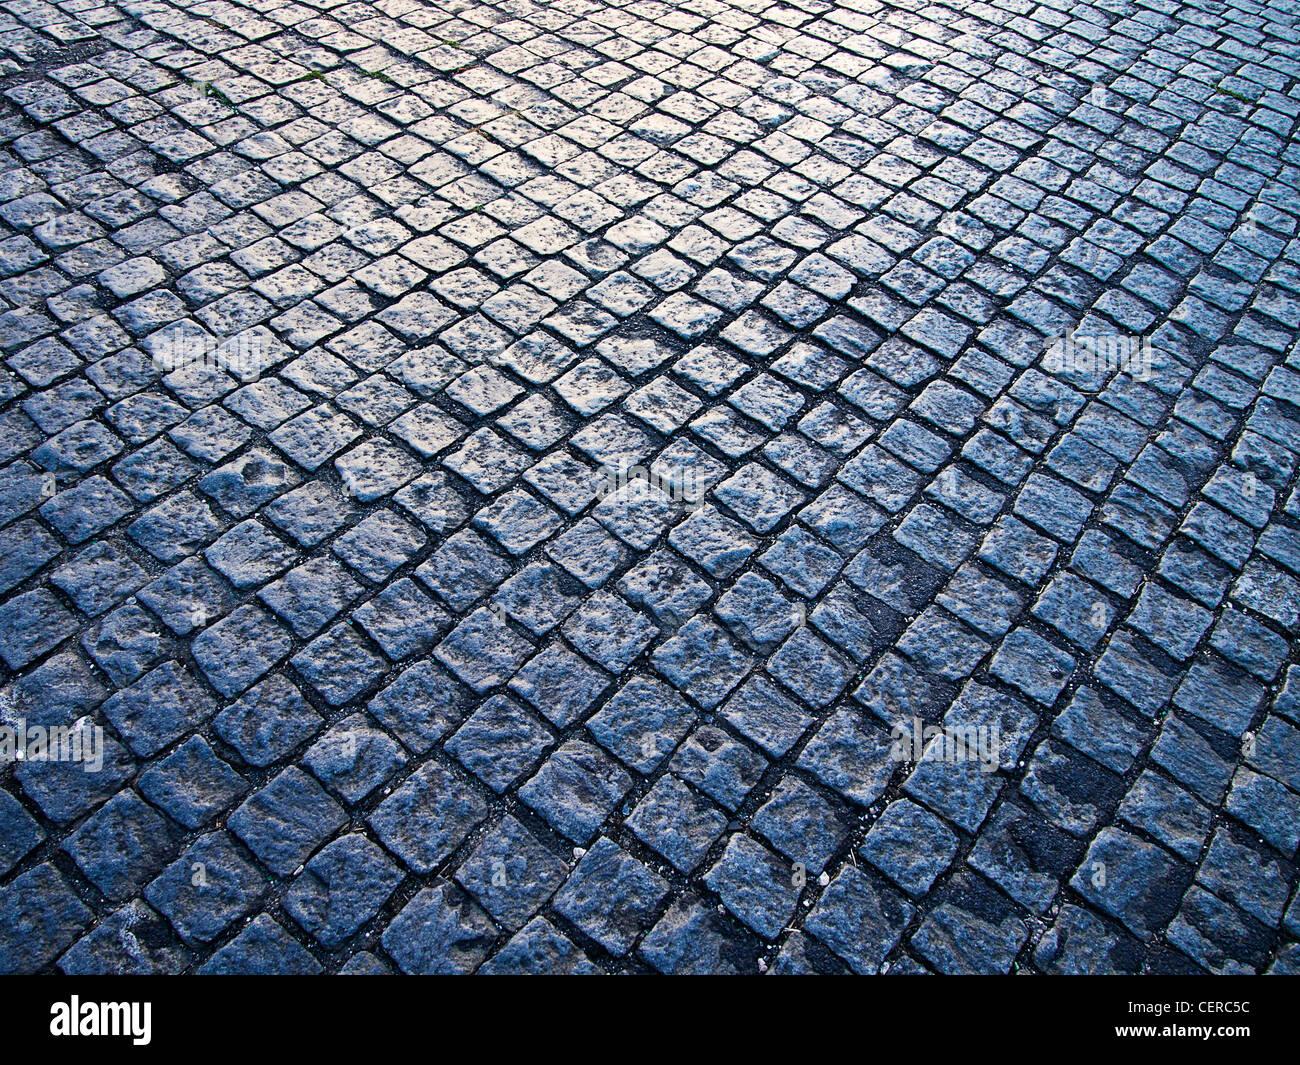 Cobblestone Pattern With Light - Stock Image